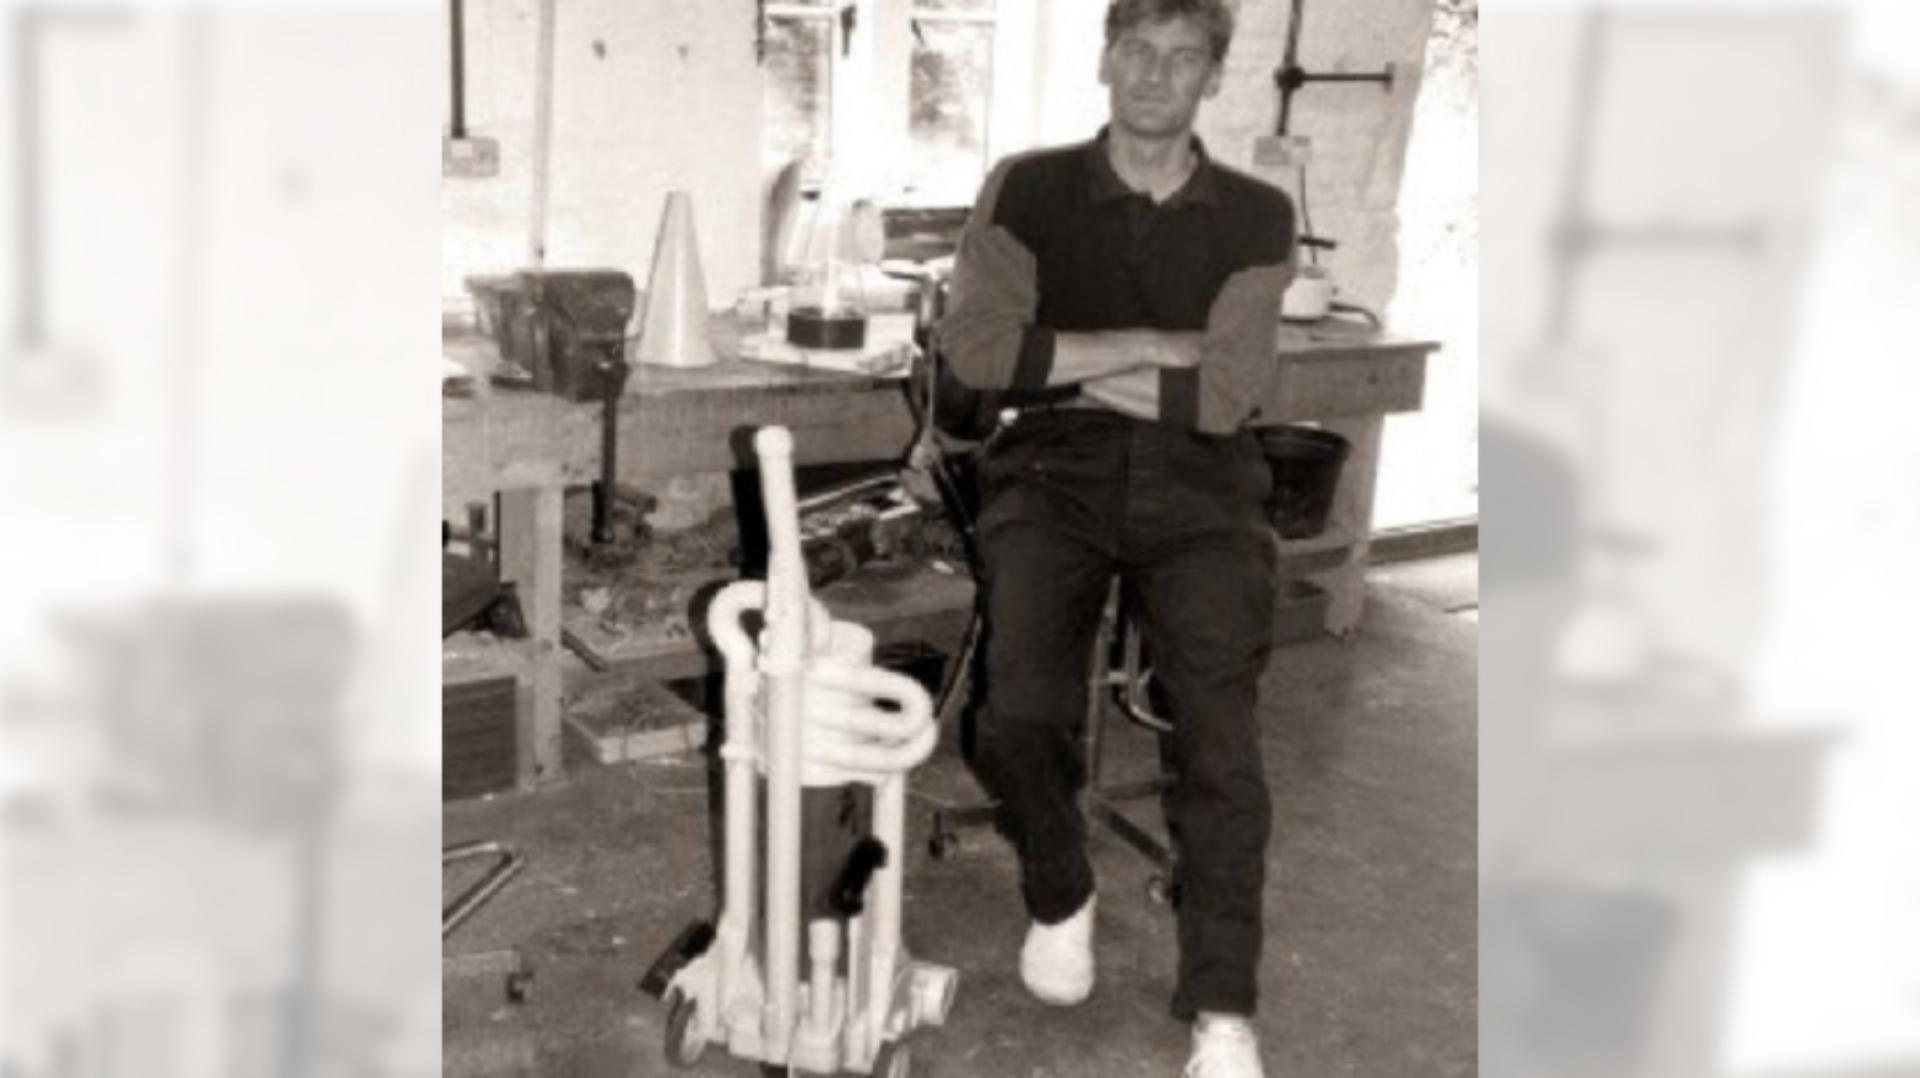 James Dyson standing next to a Kleeneze Rotork Cyclon